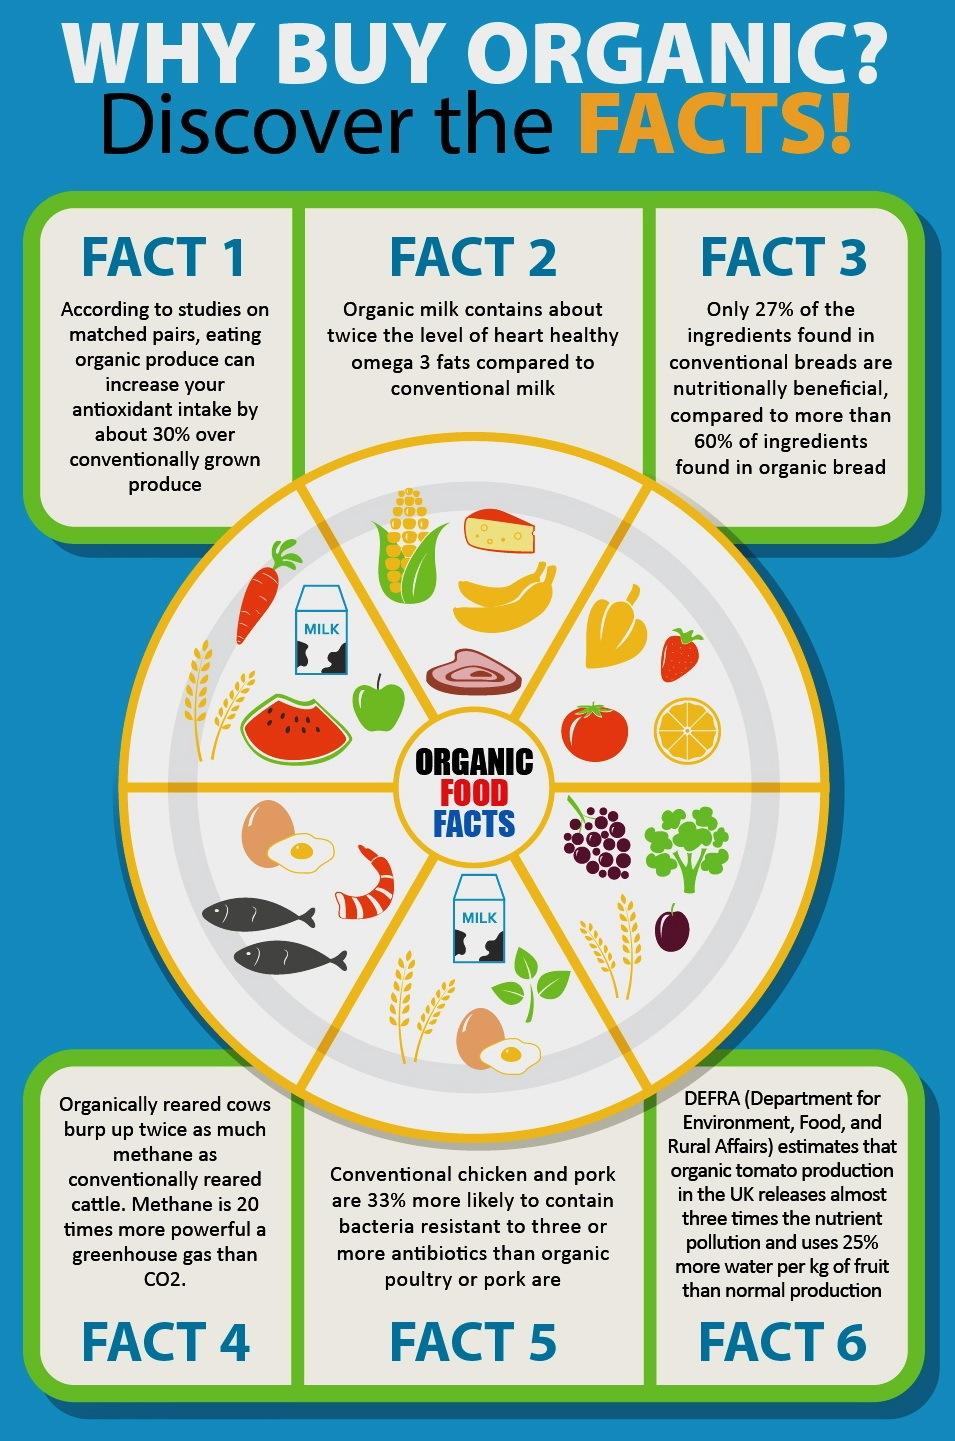 Why buy organic